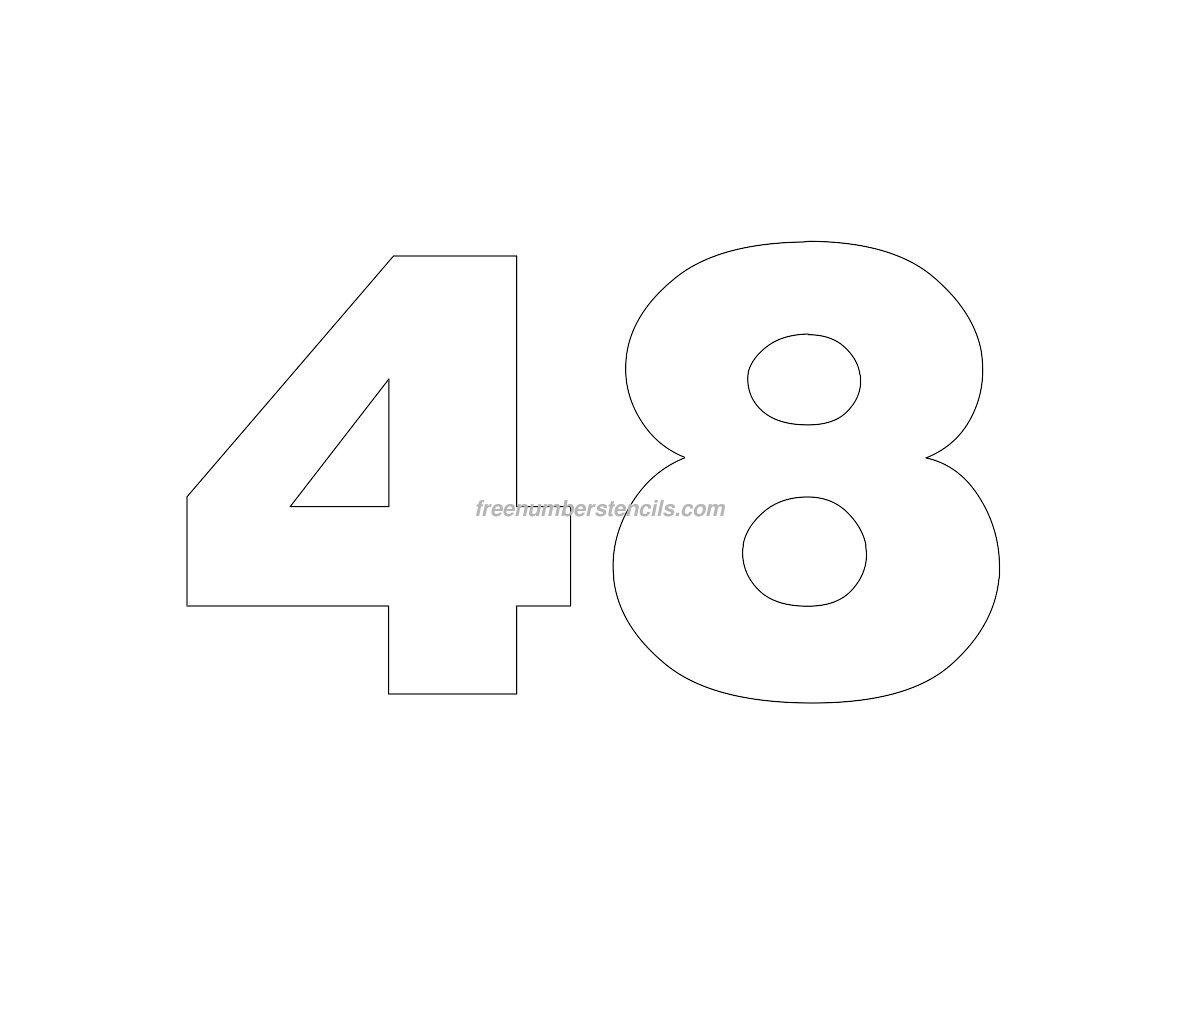 Free helvetica 48 number stencil freenumberstencilscom for Helvetica letter stencils